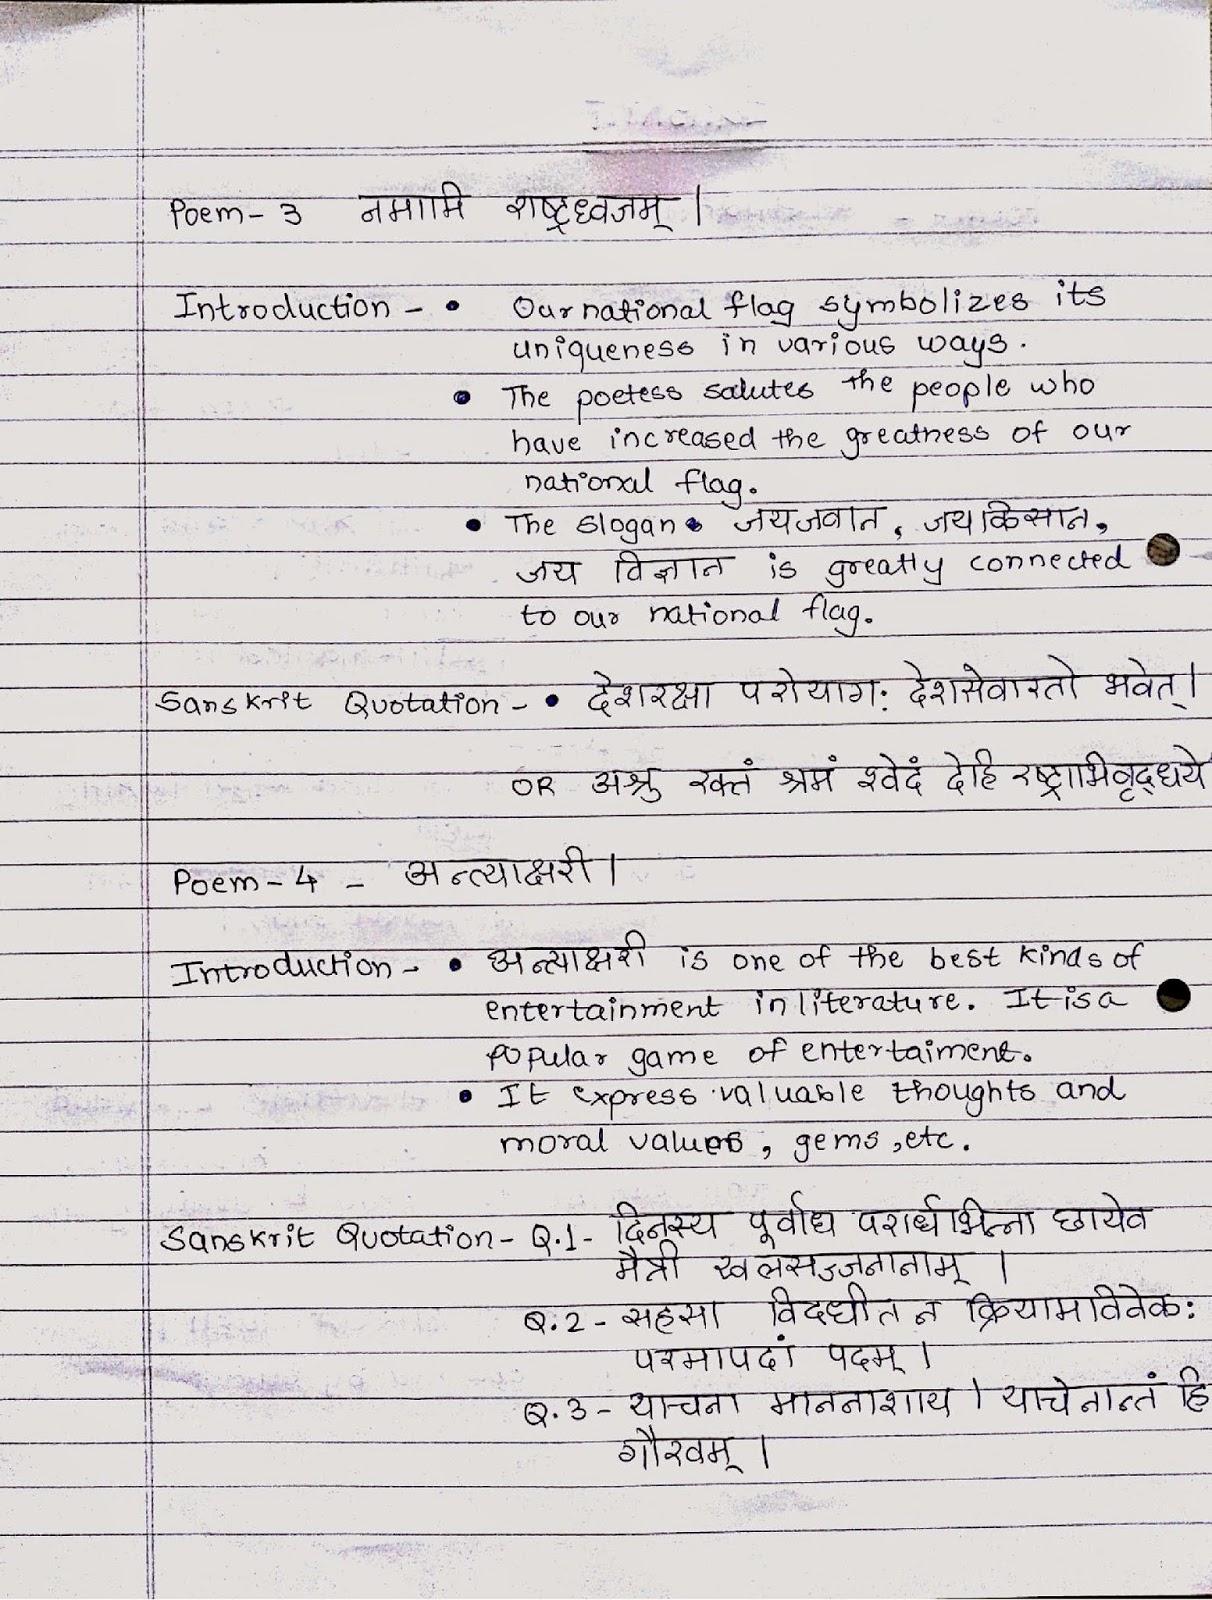 Importance Of Trees Essay In Sanskrit | Mistyhamel